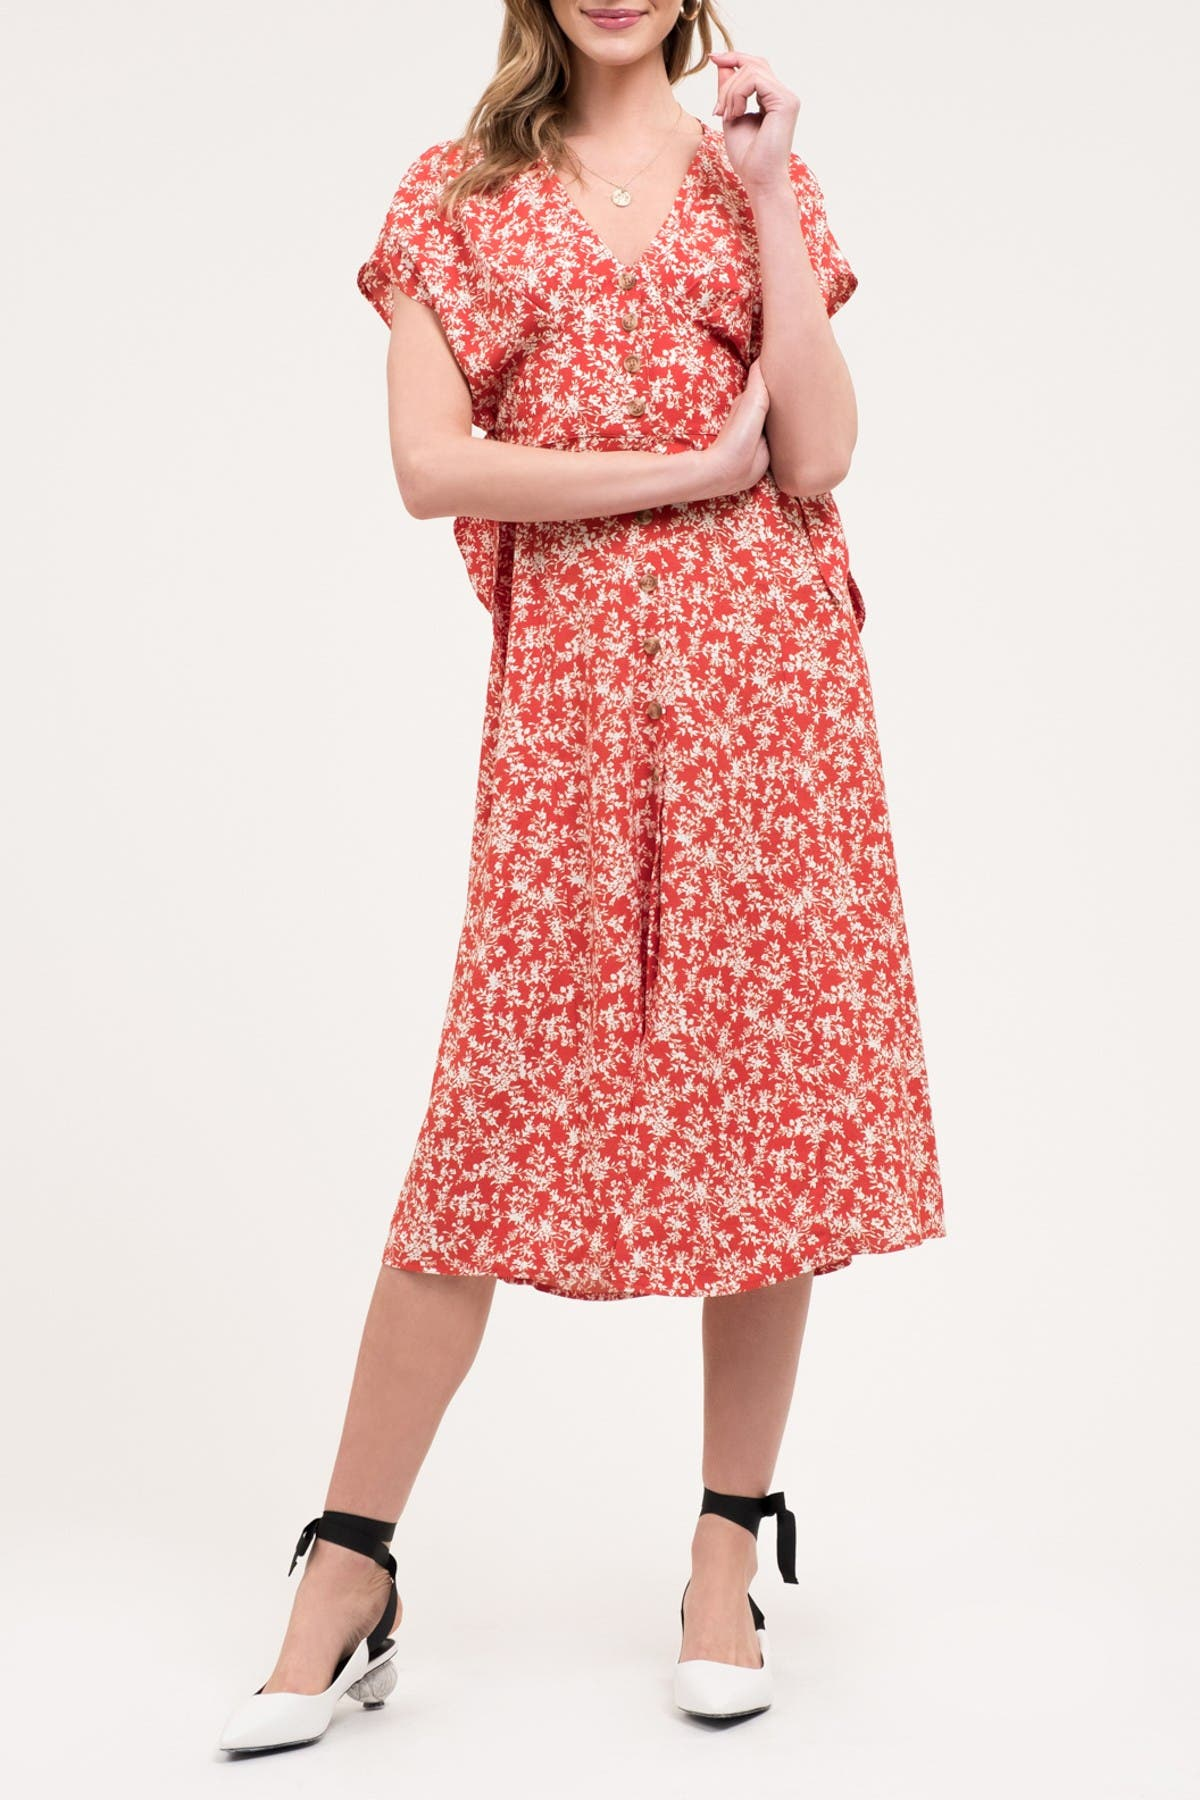 Image of Blu Pepper Short Sleeve Floral Print Midi Dress